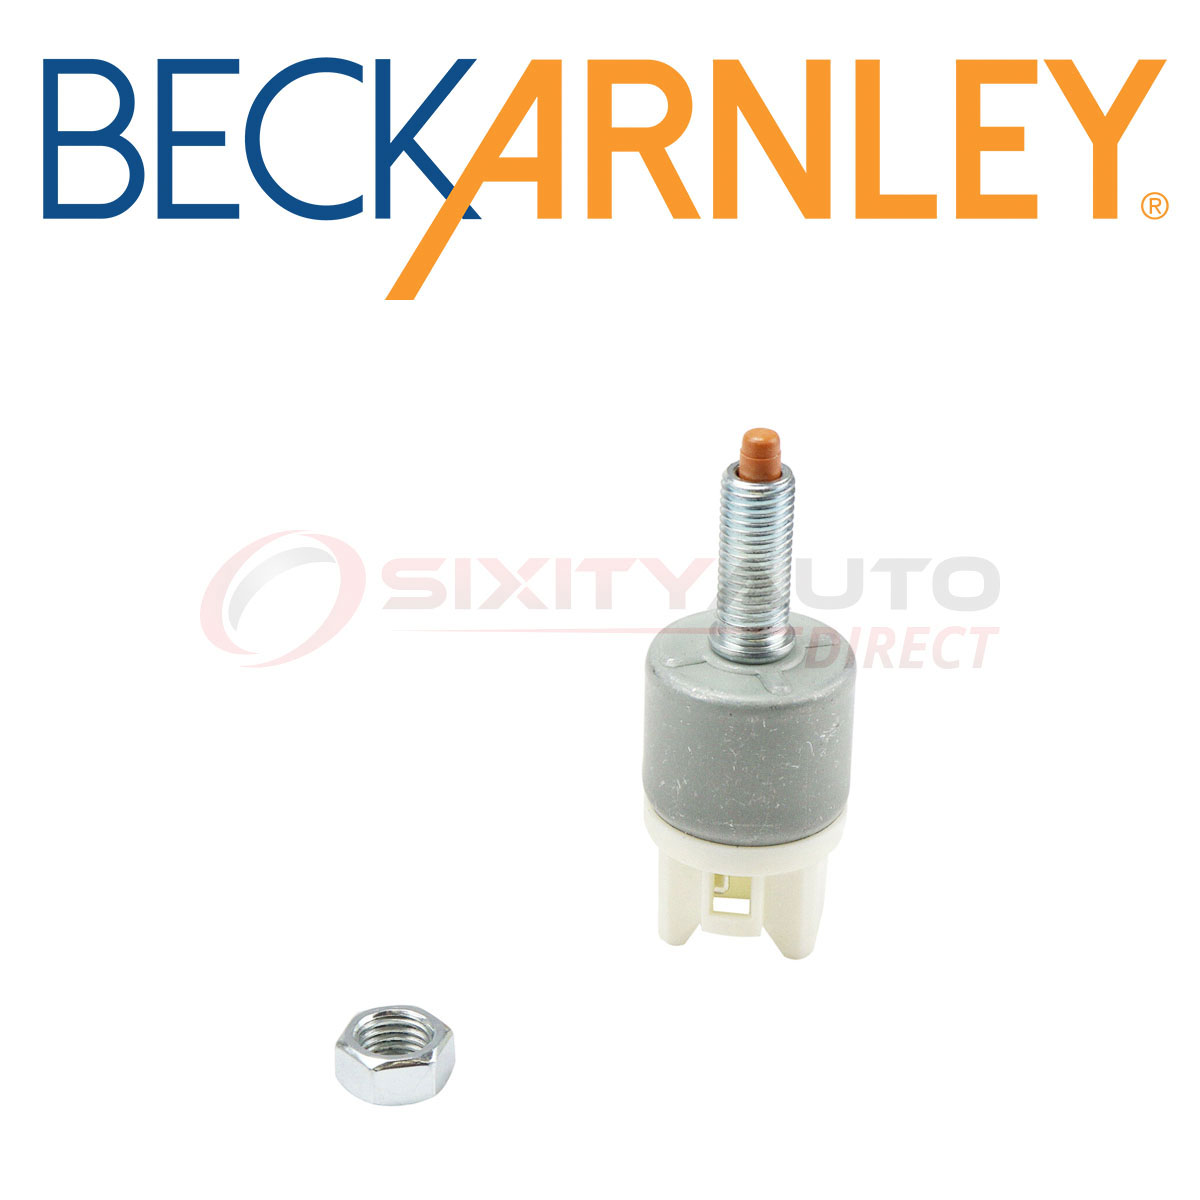 Beck Arnley Brake Light Switch For 1999-2003 Acura TL 3.2L